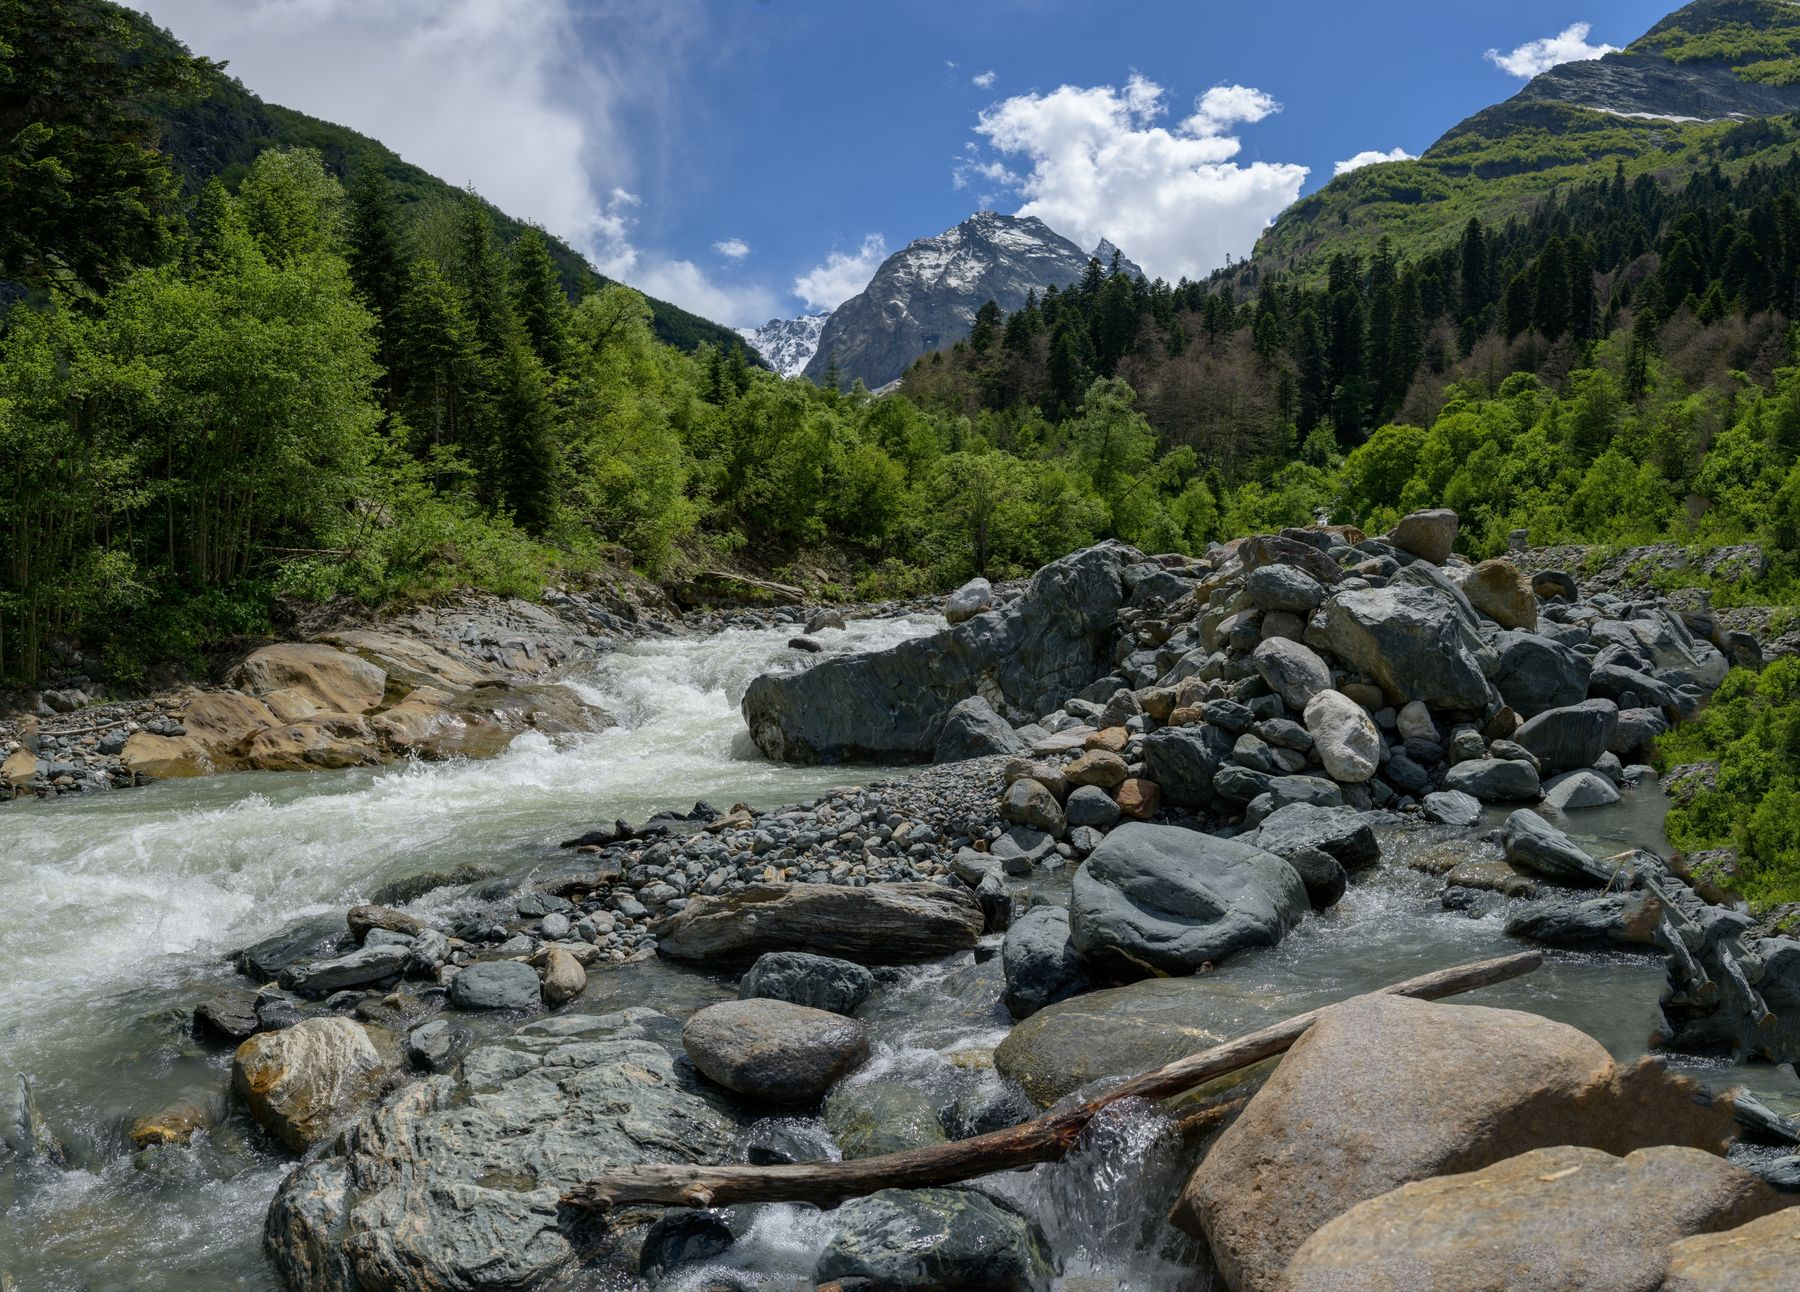 Река Аманауз горы река лето камни облака день